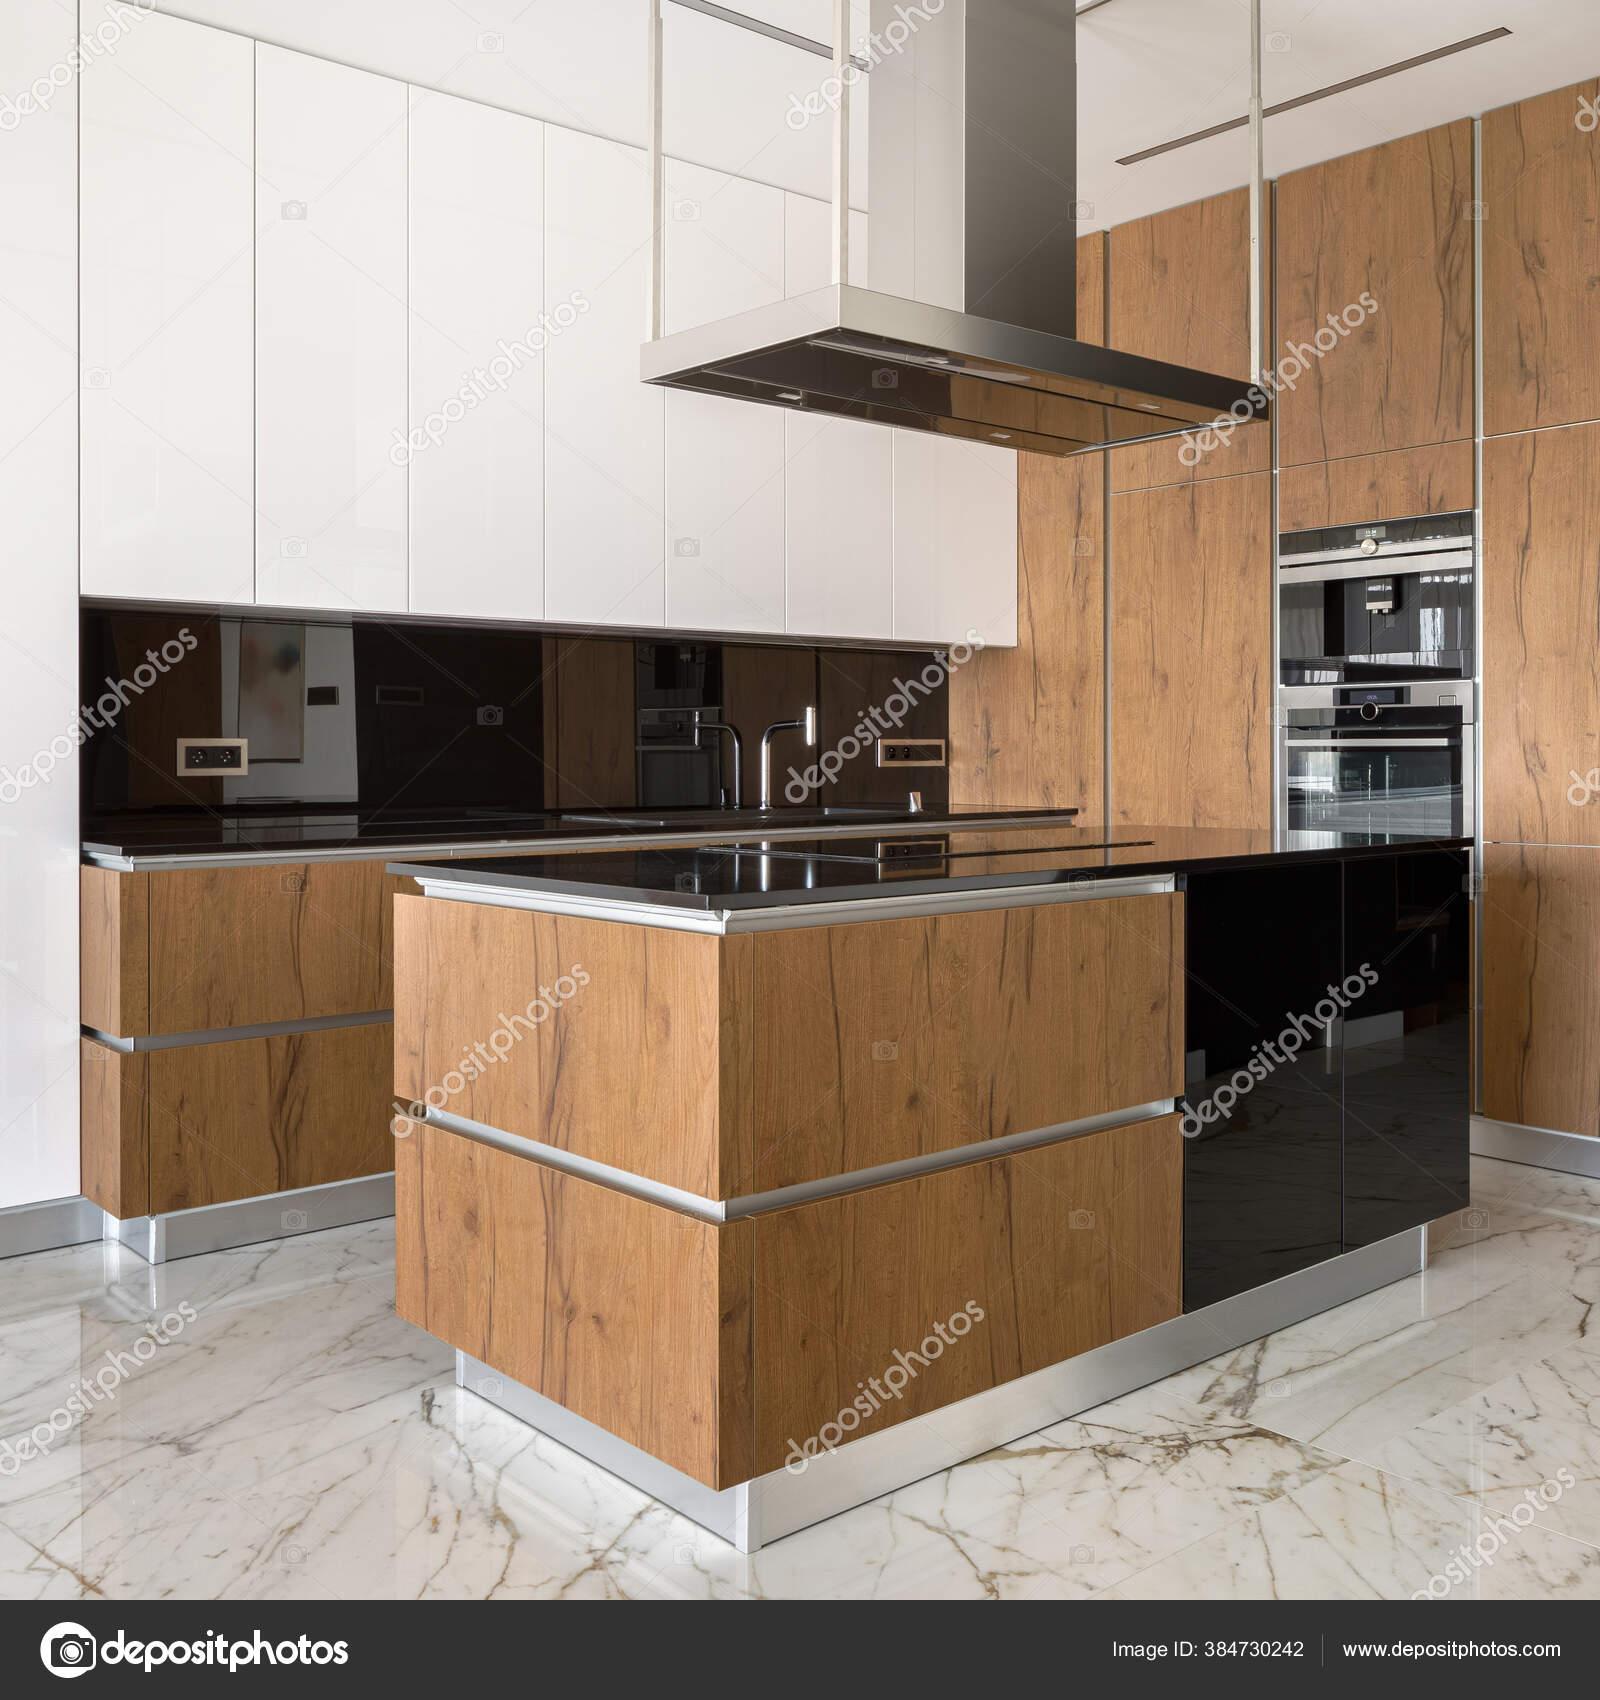 Modern Elegant Kitchen Marble Floor Tiles Wooden White Furniture Kitchen Stock Photo C In4mal 384730242